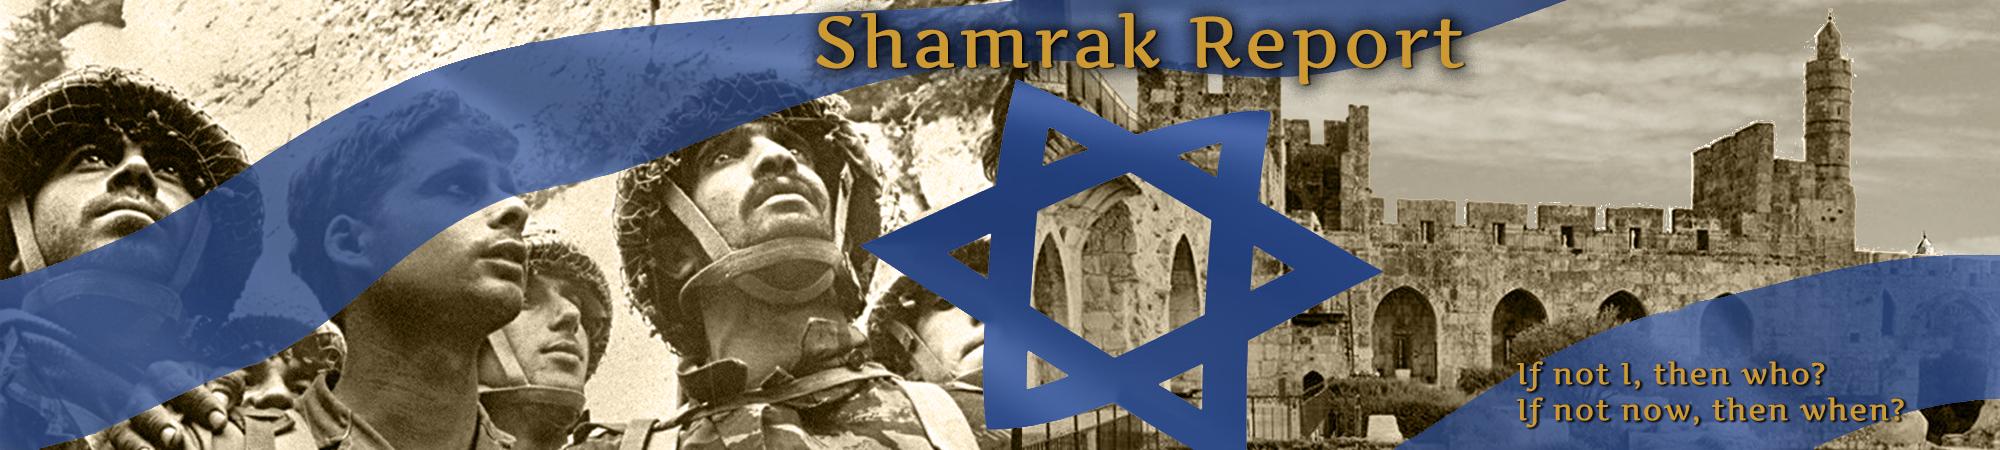 Shamrak.com